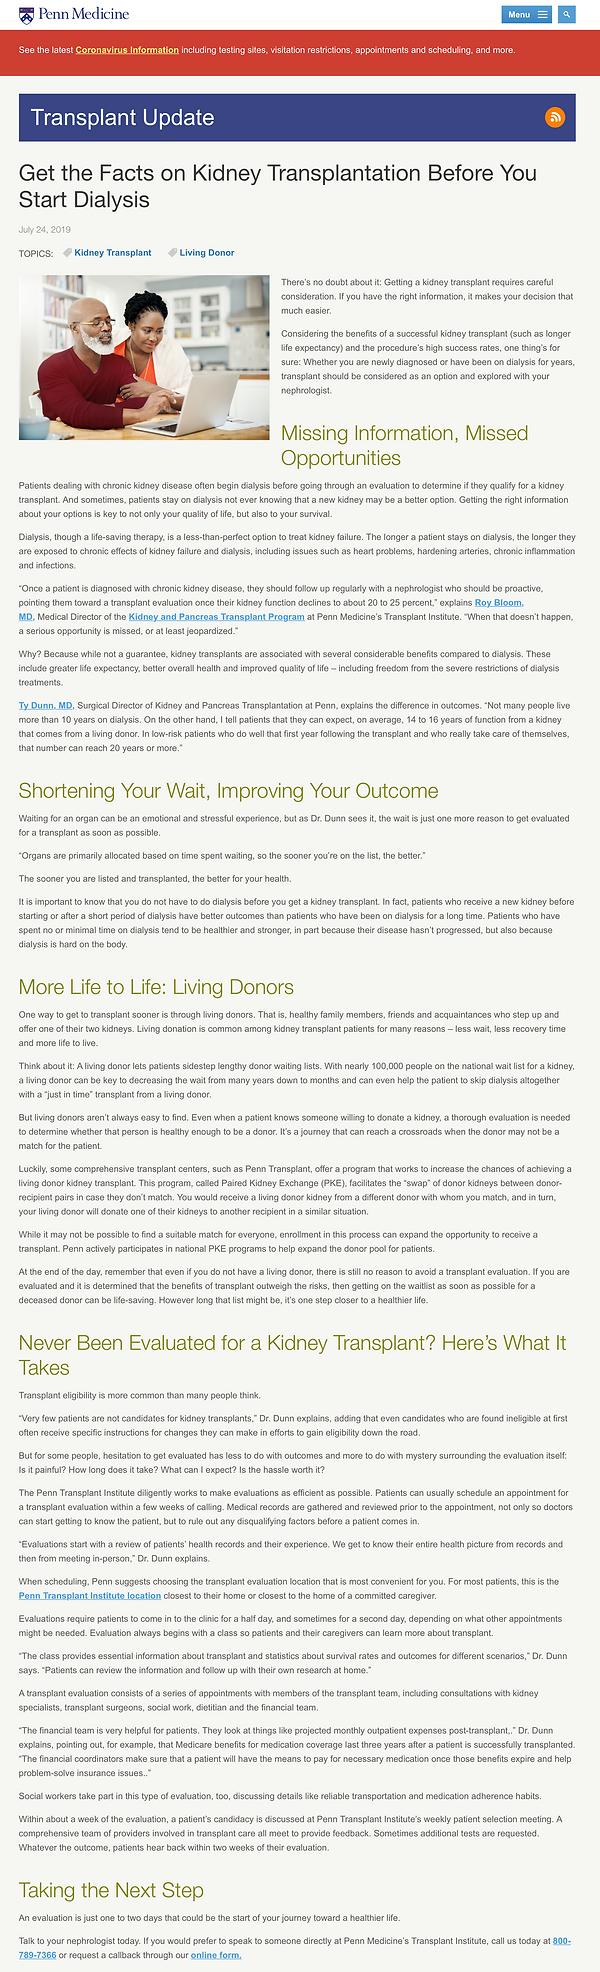 Get_the_Facts_on_Kidney_Transplantation_